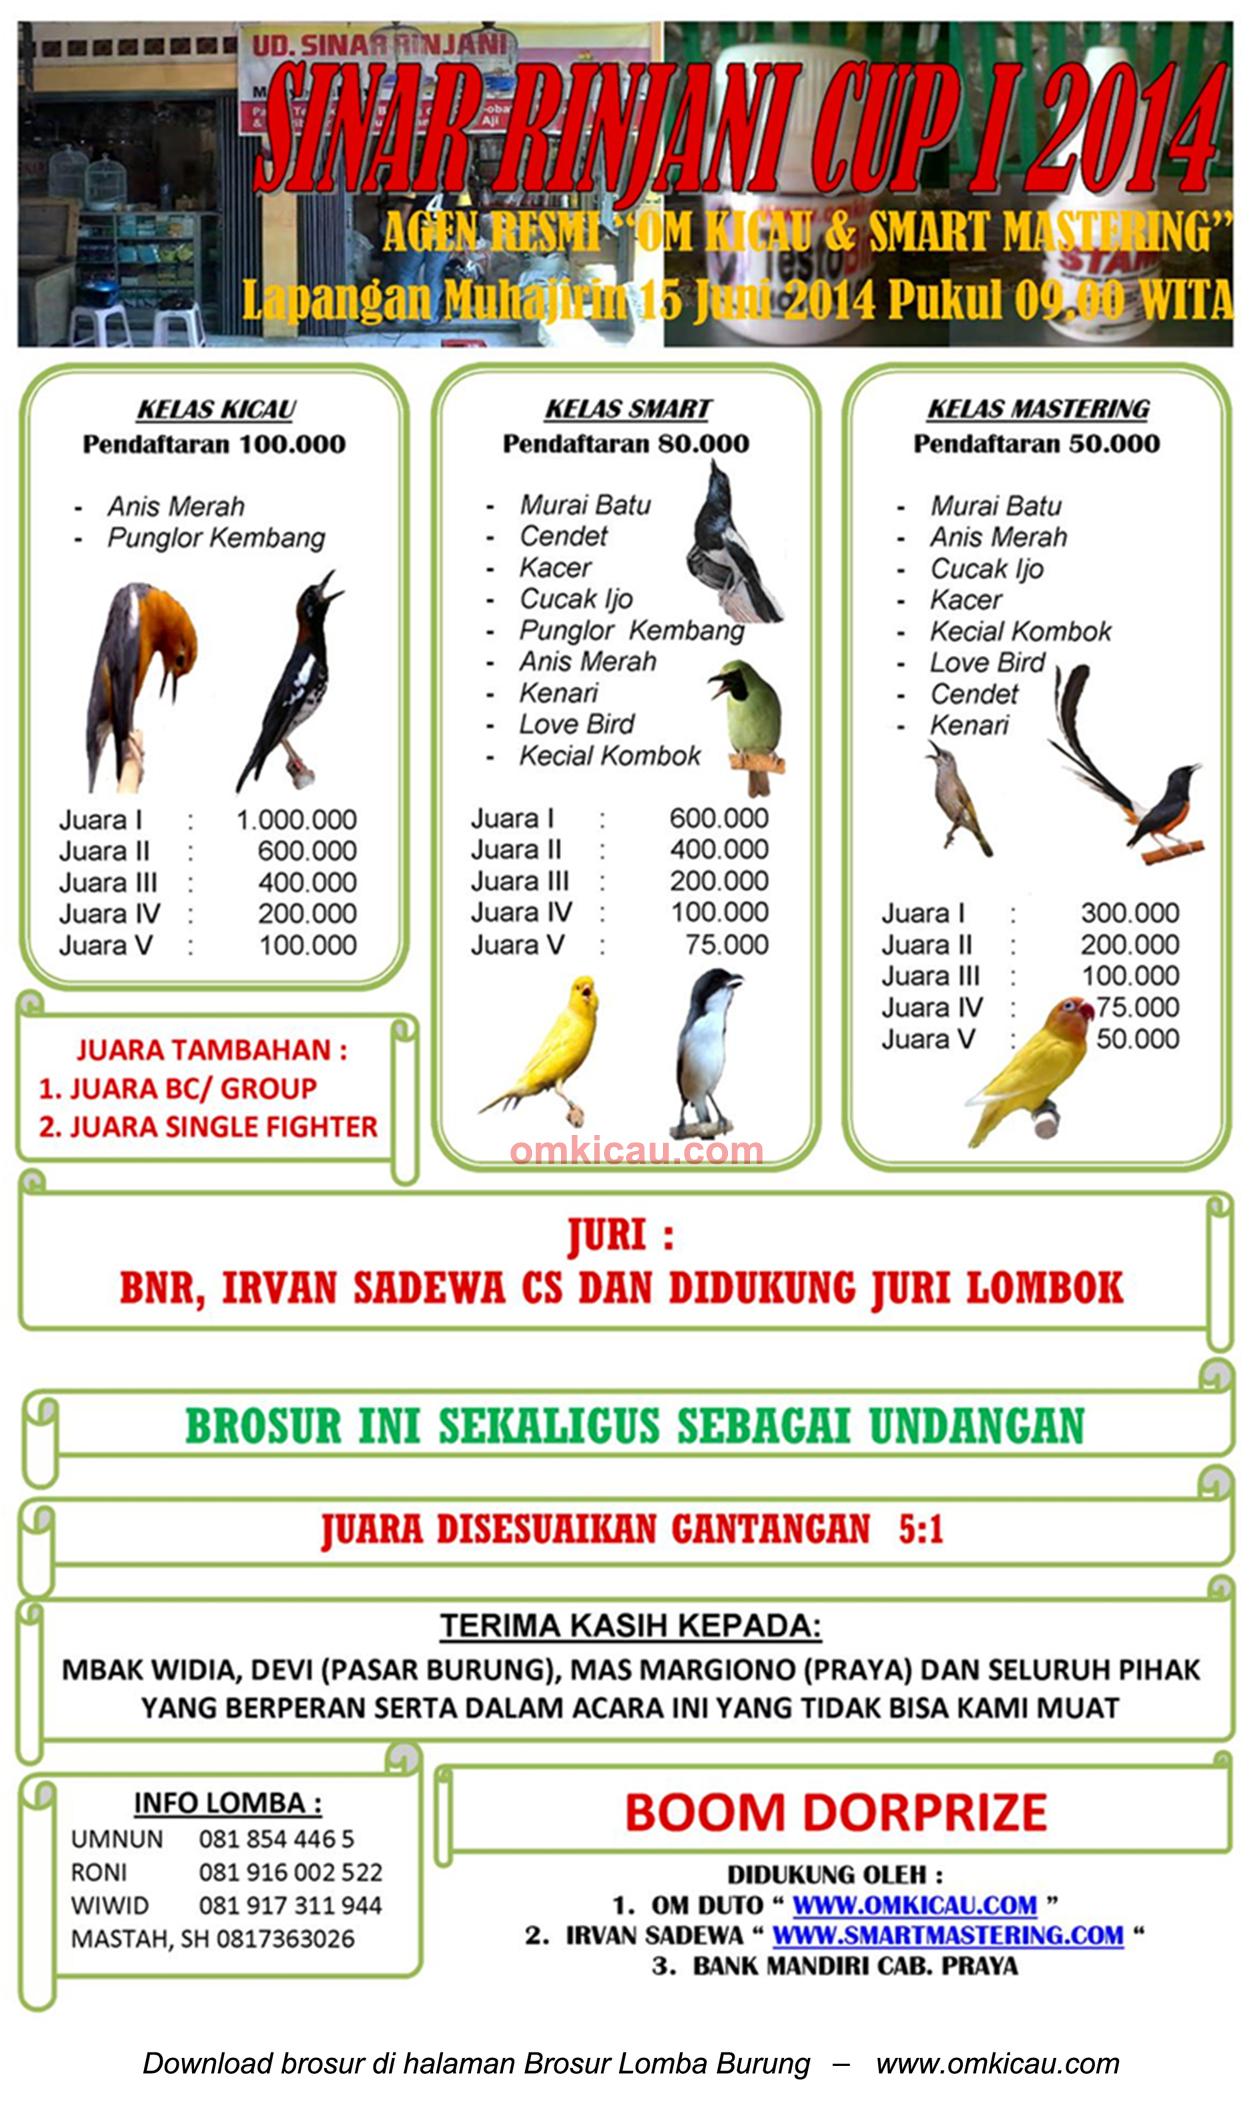 Lomba Burung Sinar Rinjani Cup I